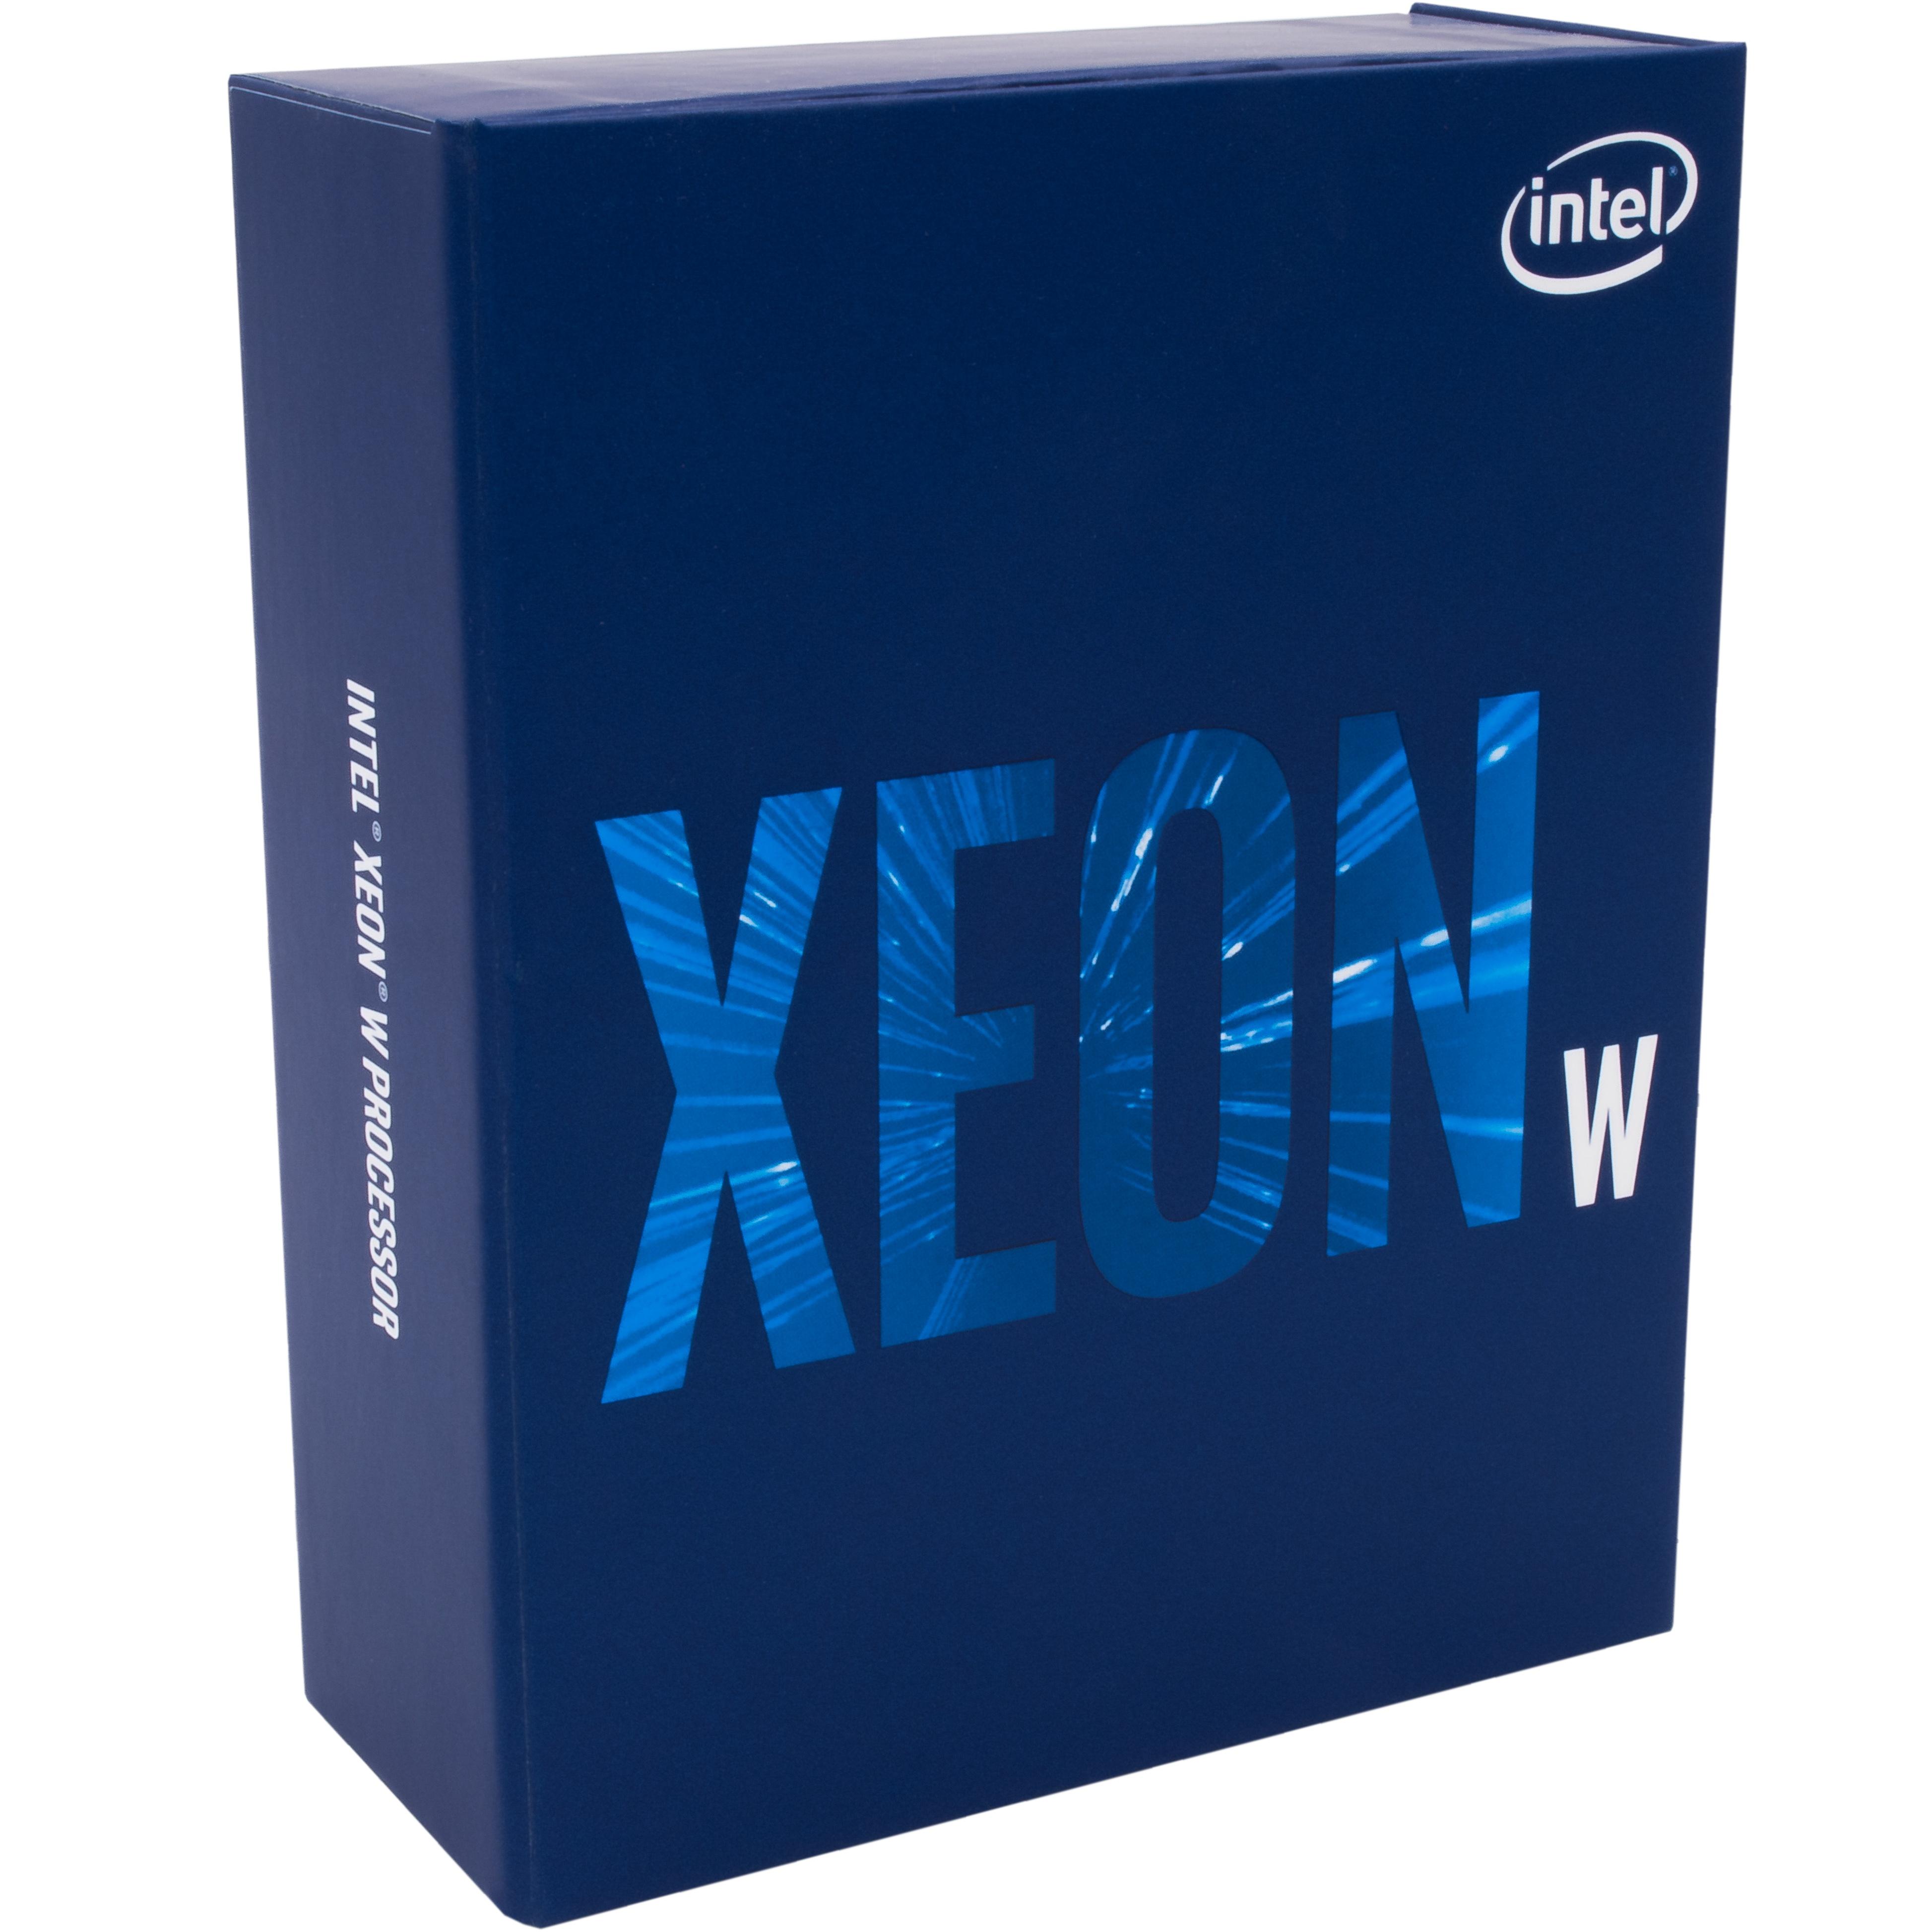 Intel-Xeon-W-3175X-2